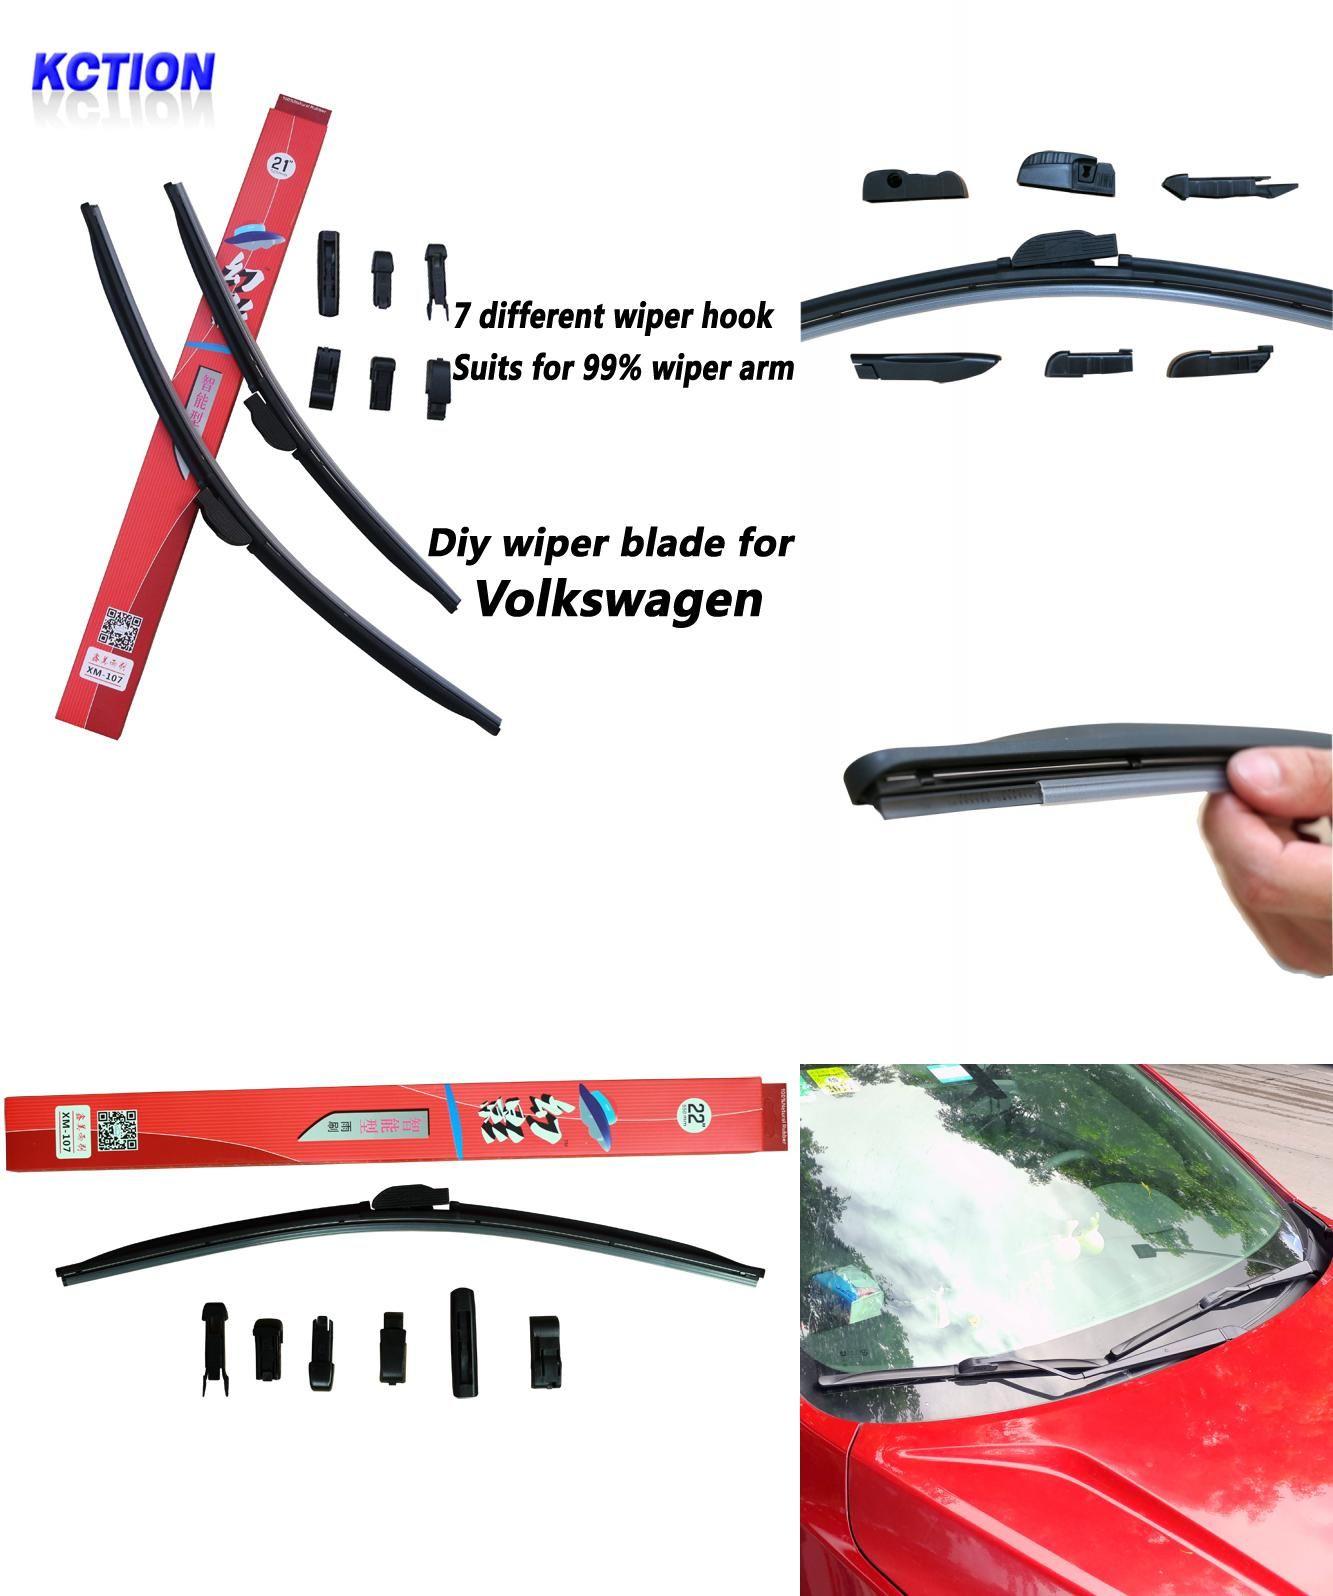 Visit To Buy Car Windshield Wiper Blade For Volkswagen Jetta 5 Jetta 6 Passat B5 B6 B7 Cc Polo Mk4 Mk5 G Car Windshield Wipers Windshield Wipers Wiper Blades